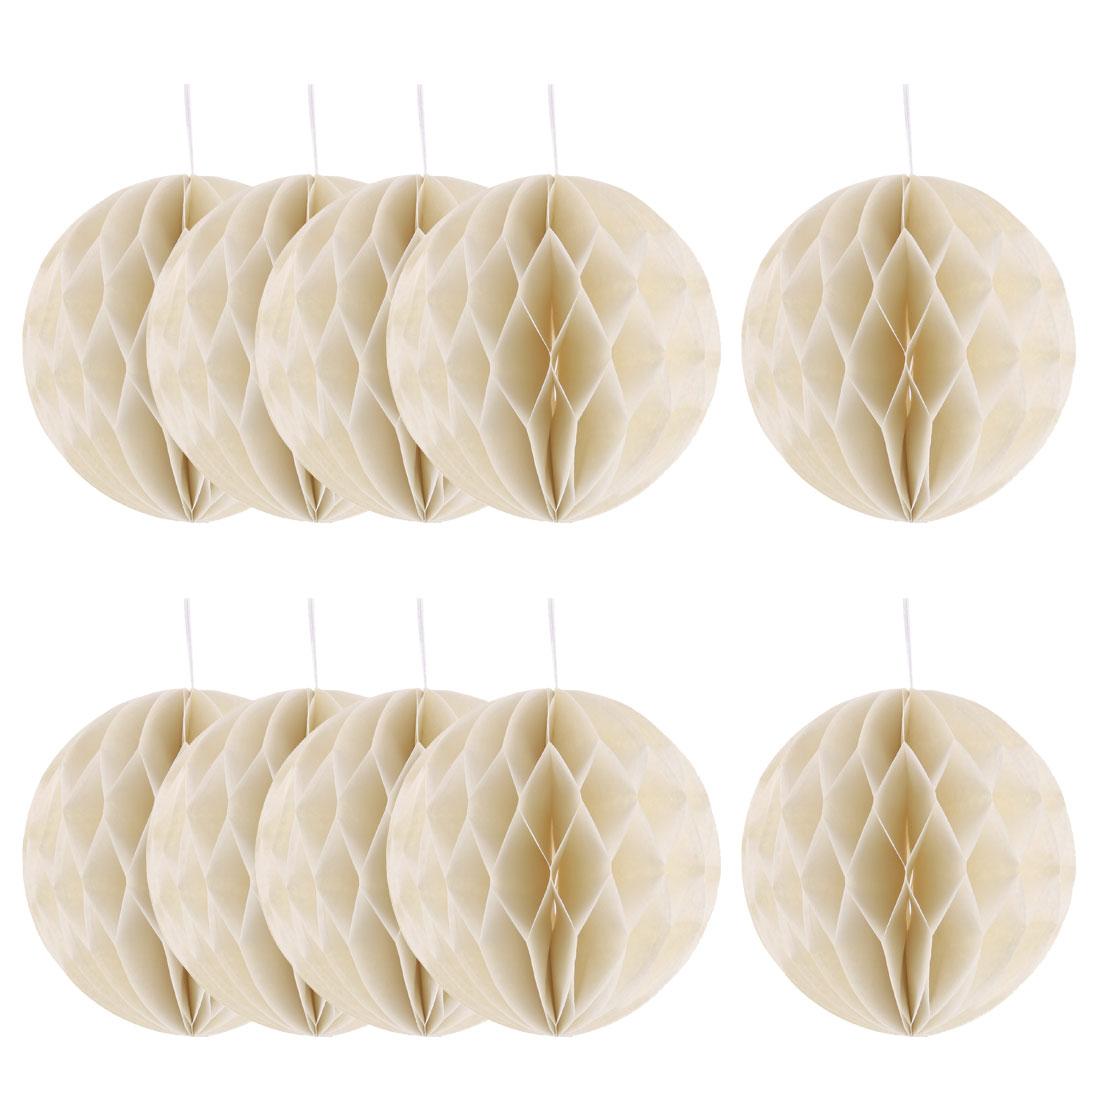 Household Party Paper Wall Window Door DIY Decoration Honeycomb Ball Beige 4 Inch Dia 10 Pcs